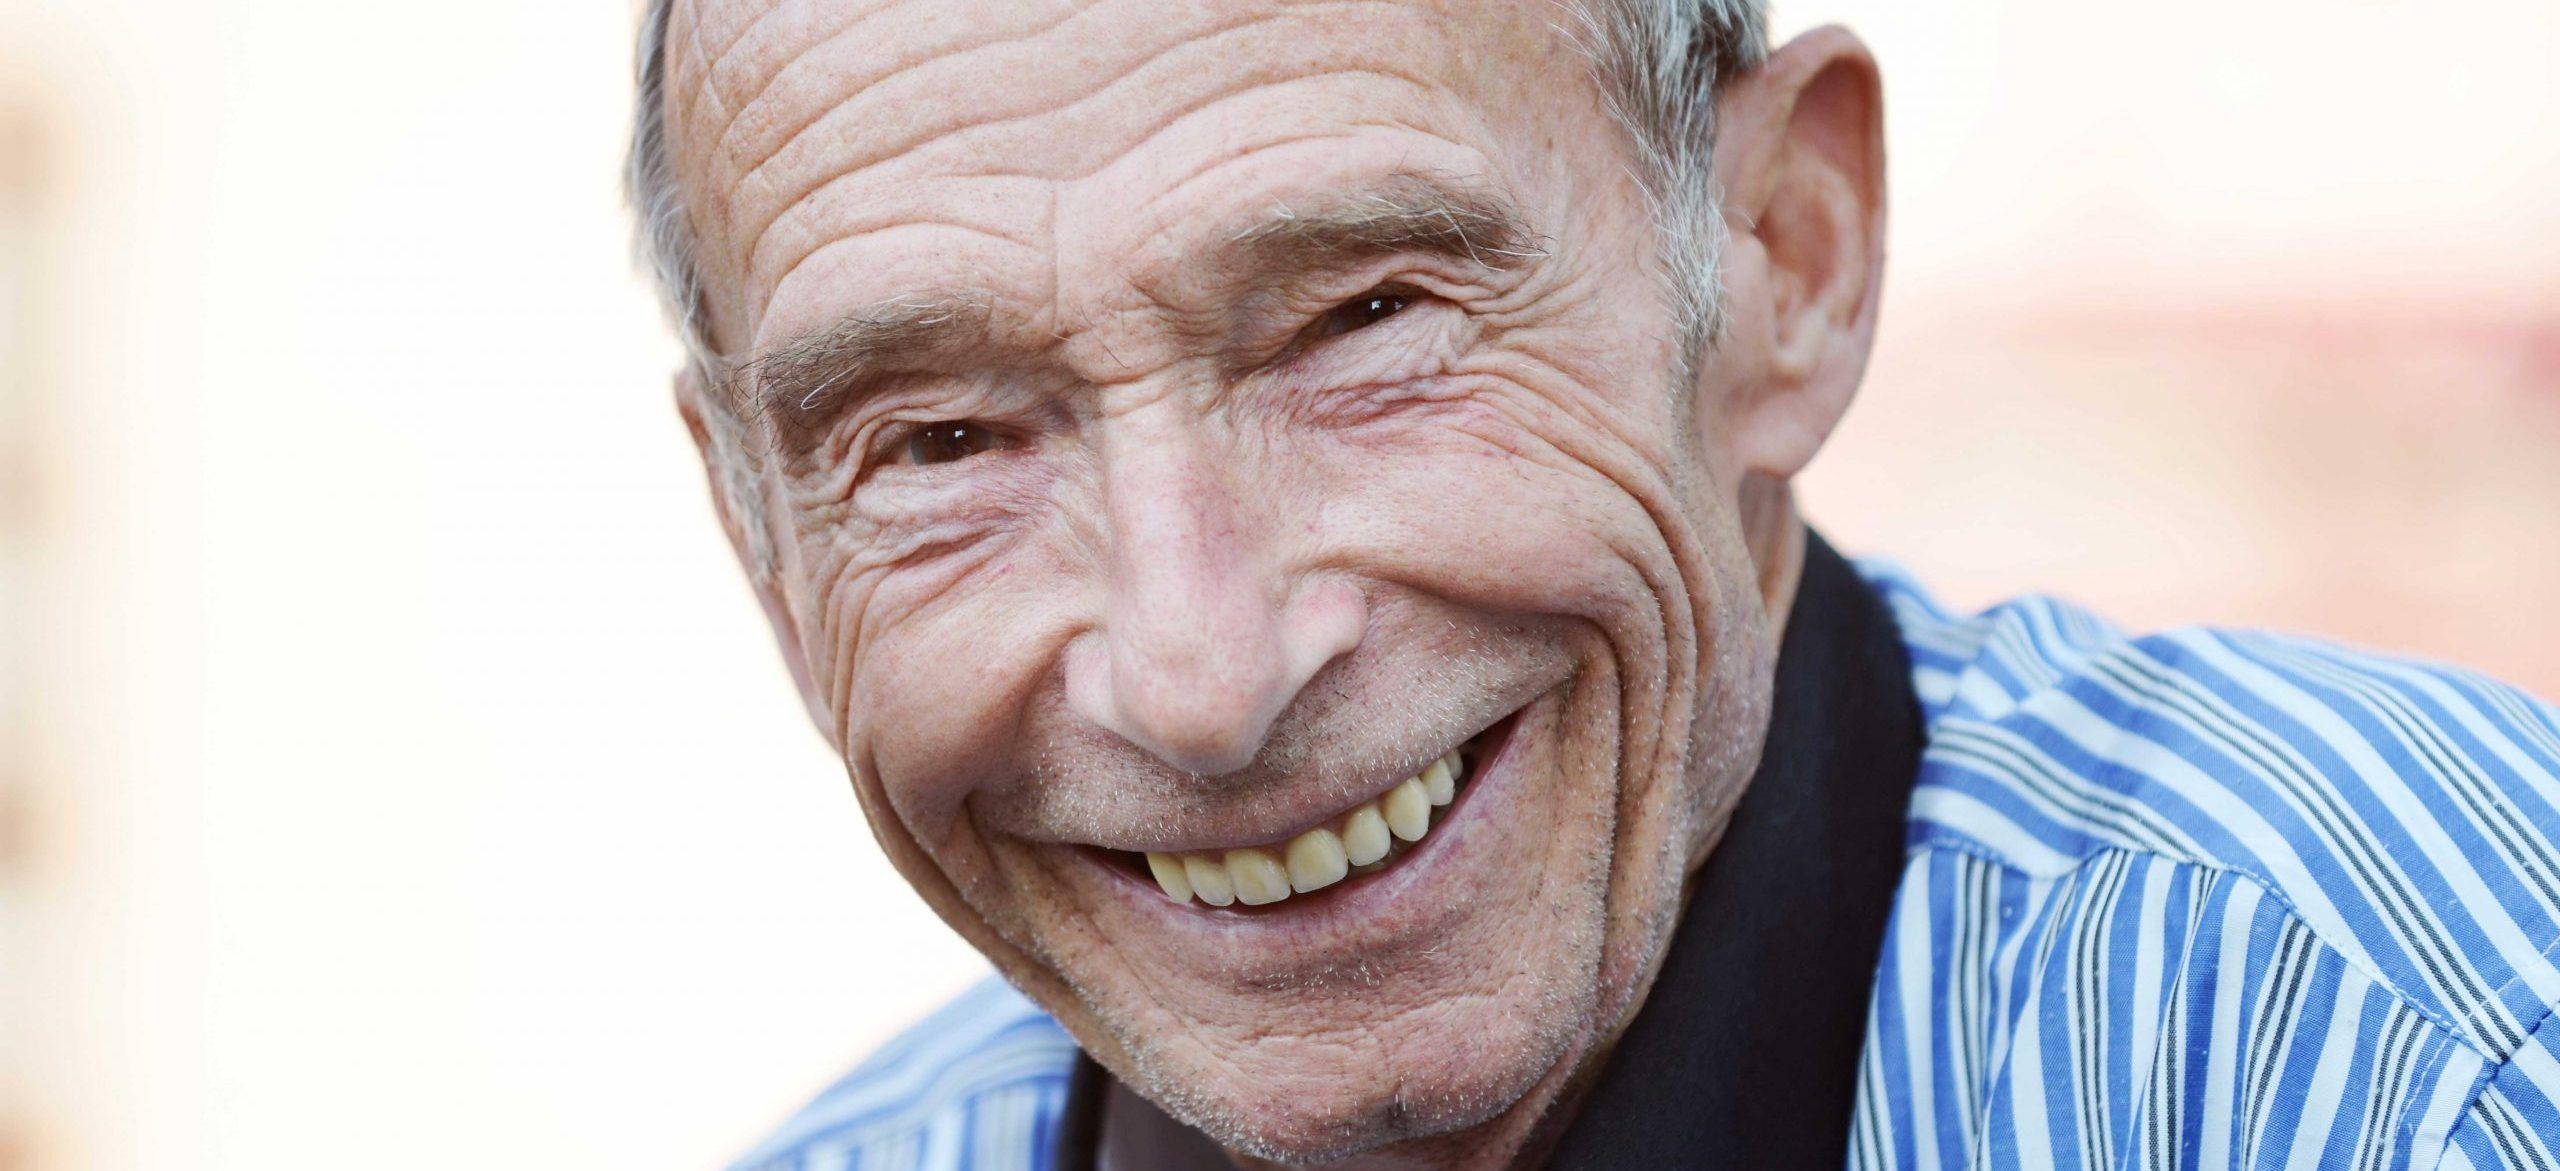 happy, smiling senior man